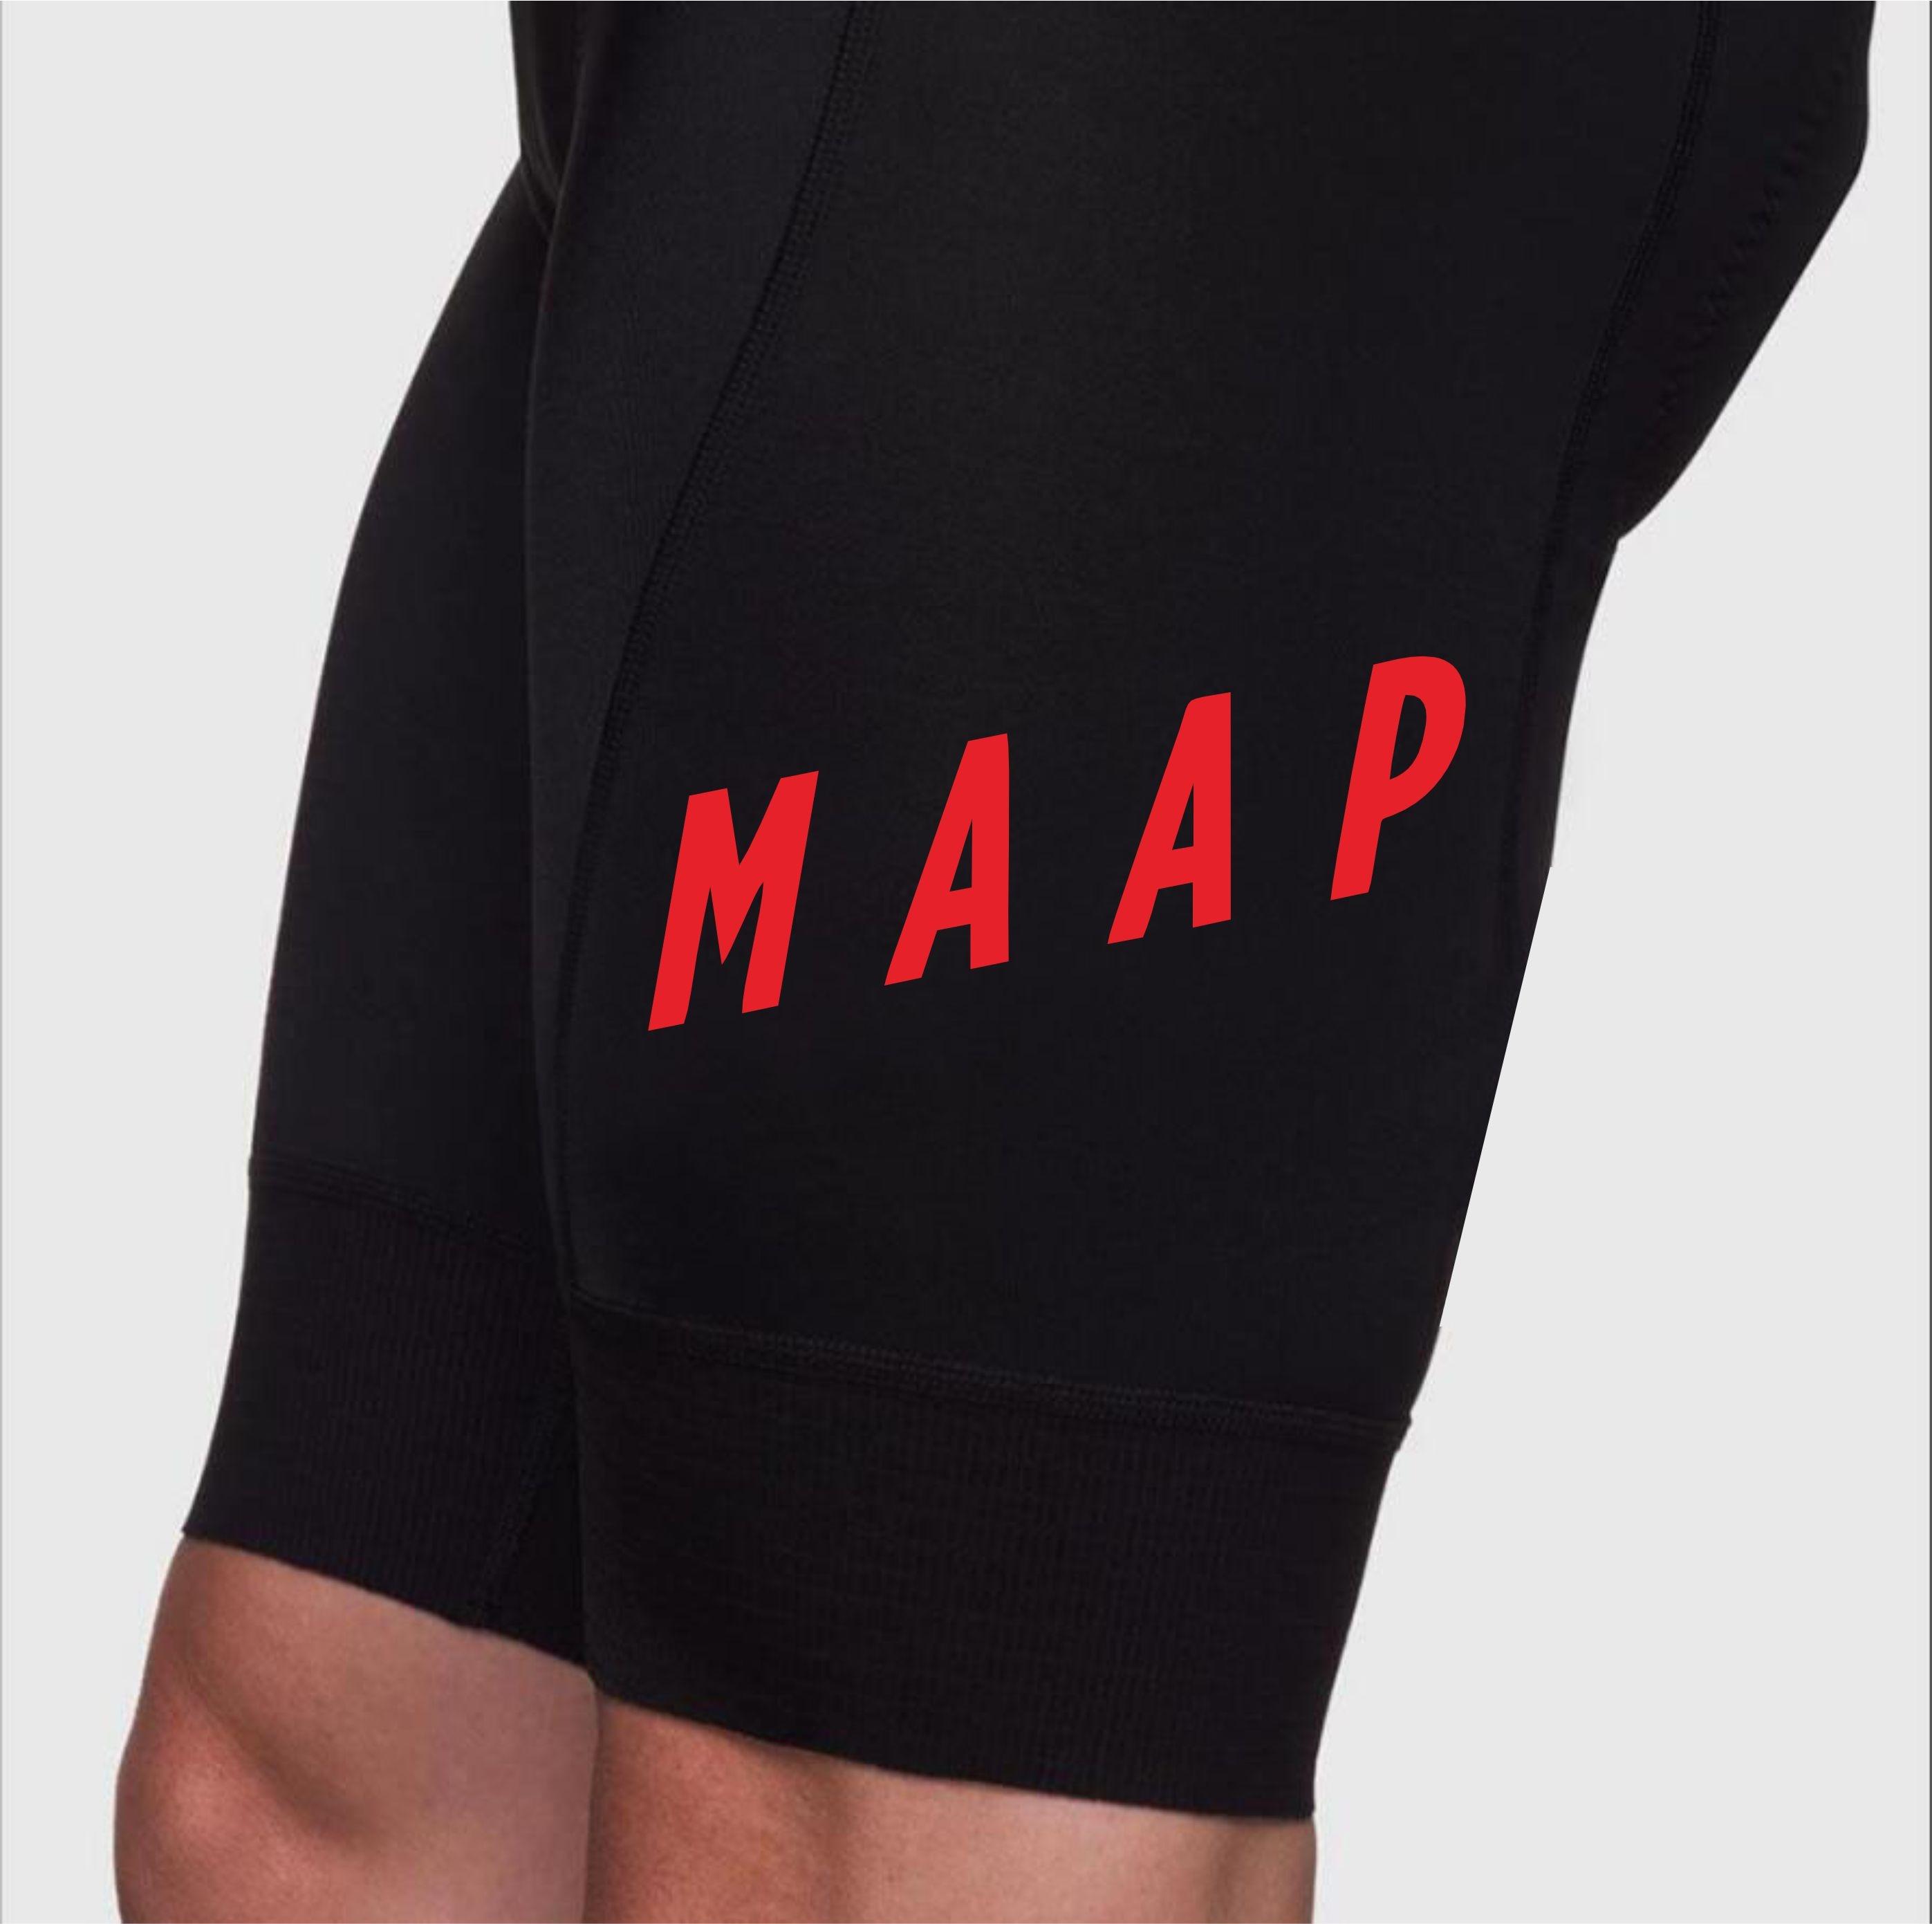 New Men/'s Road MTB Biking Bibs Shorts Cycling Bottoms Wear Padded Pants Cushion